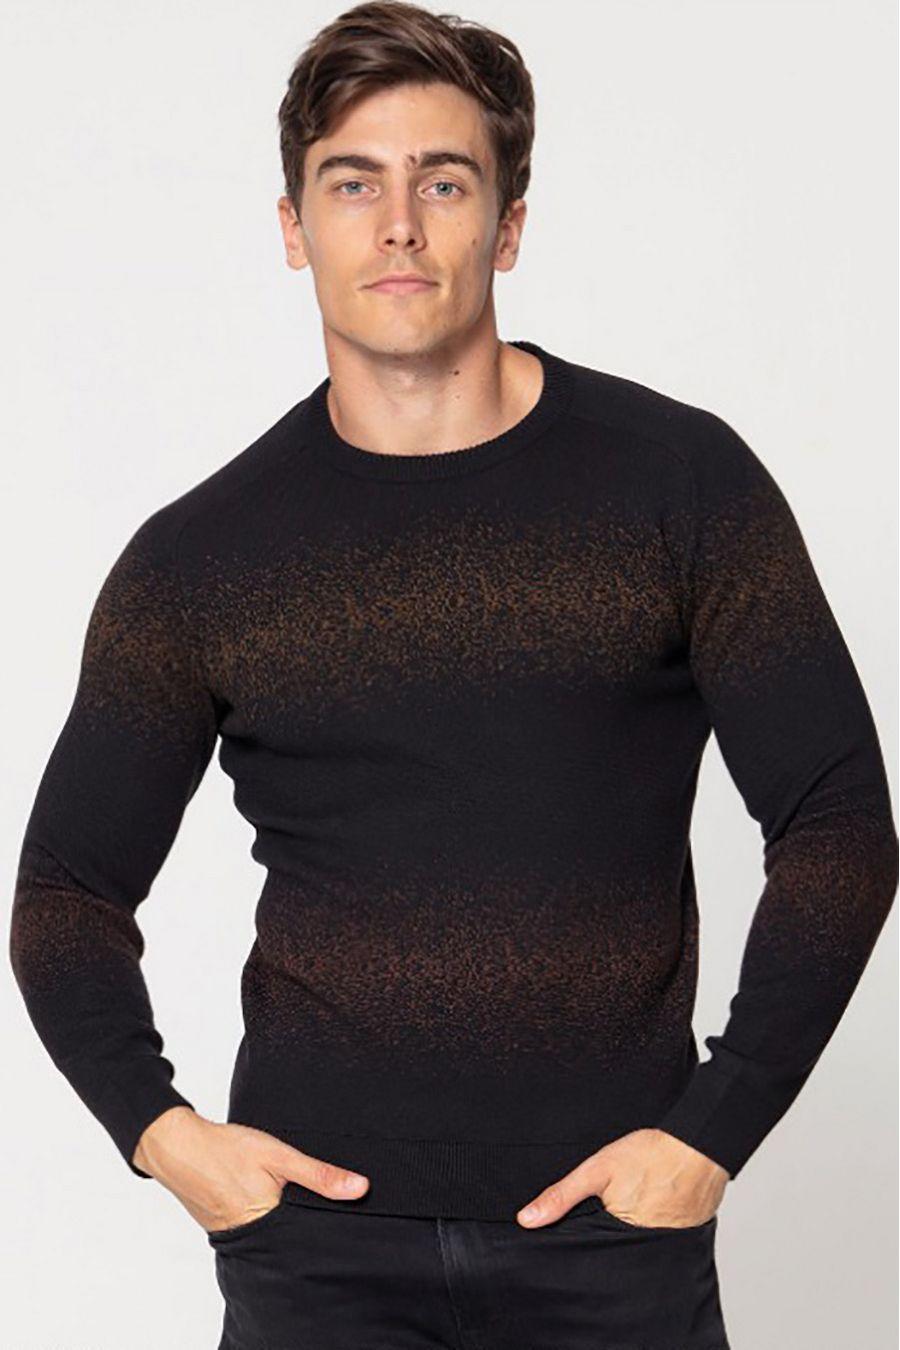 Джемпер (свитер) мужской Pooll Park 201401 Black (Red) - фото 1